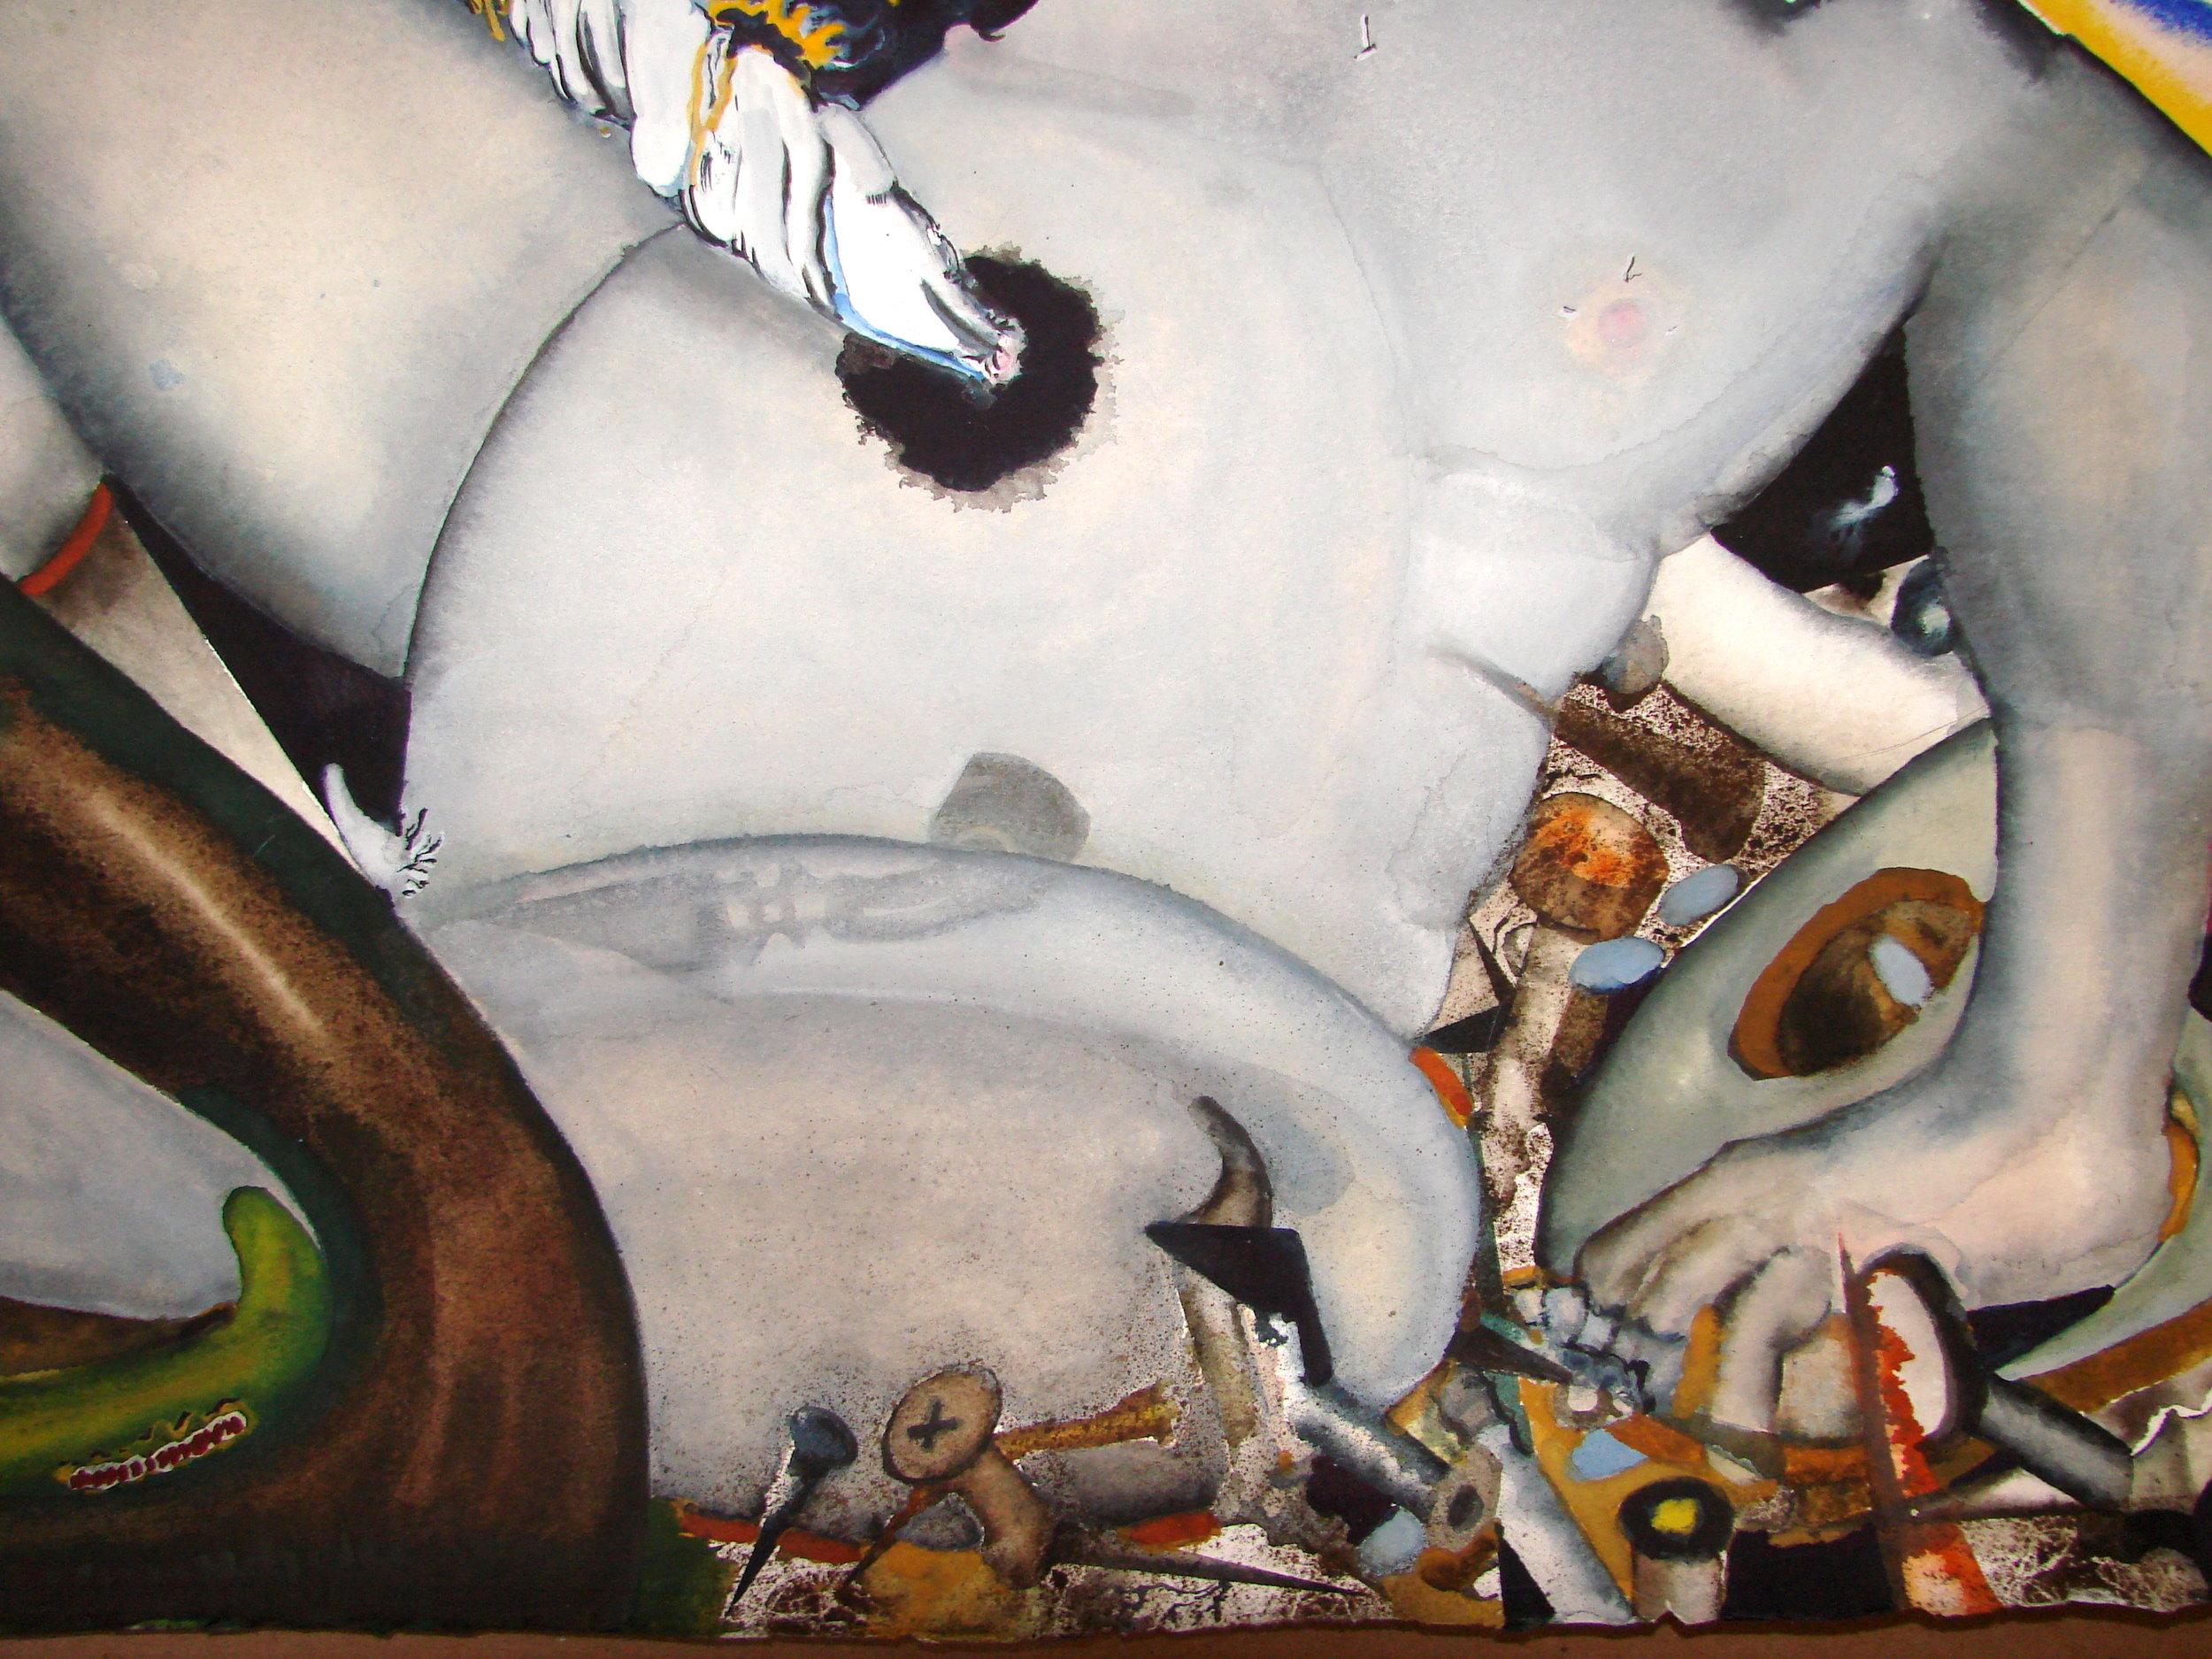 Detail, belly of felled white man